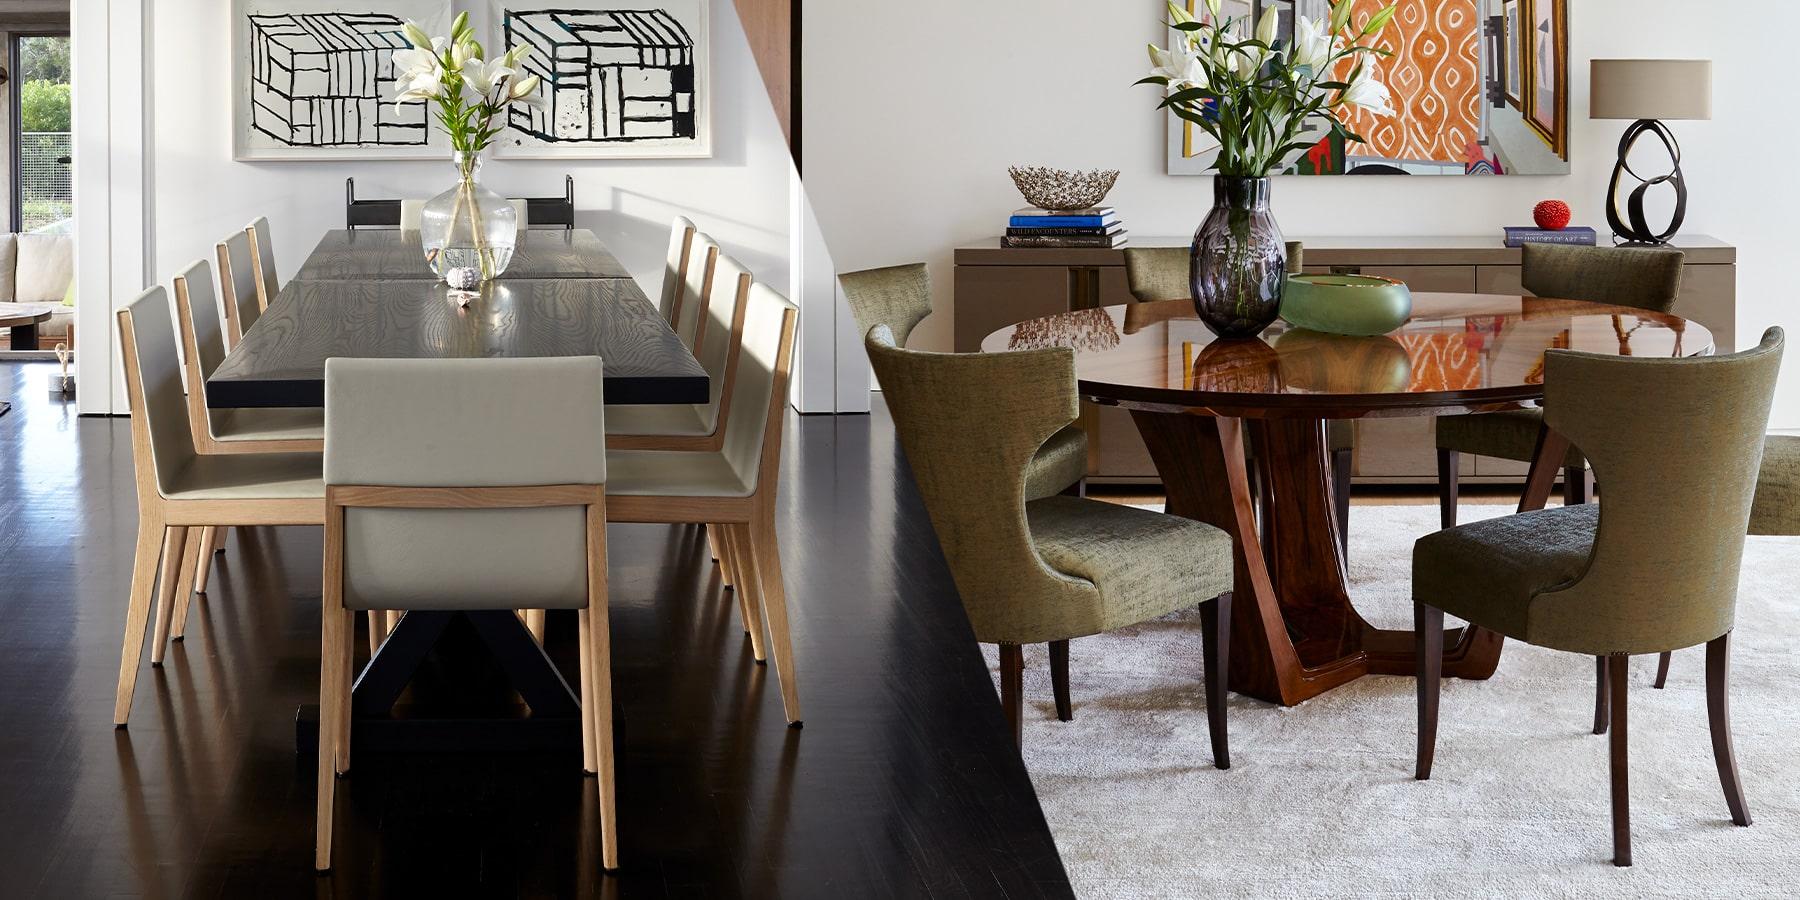 Fantastic Boston Based Designer Heather Wells Has A Way With Art Short Links Chair Design For Home Short Linksinfo